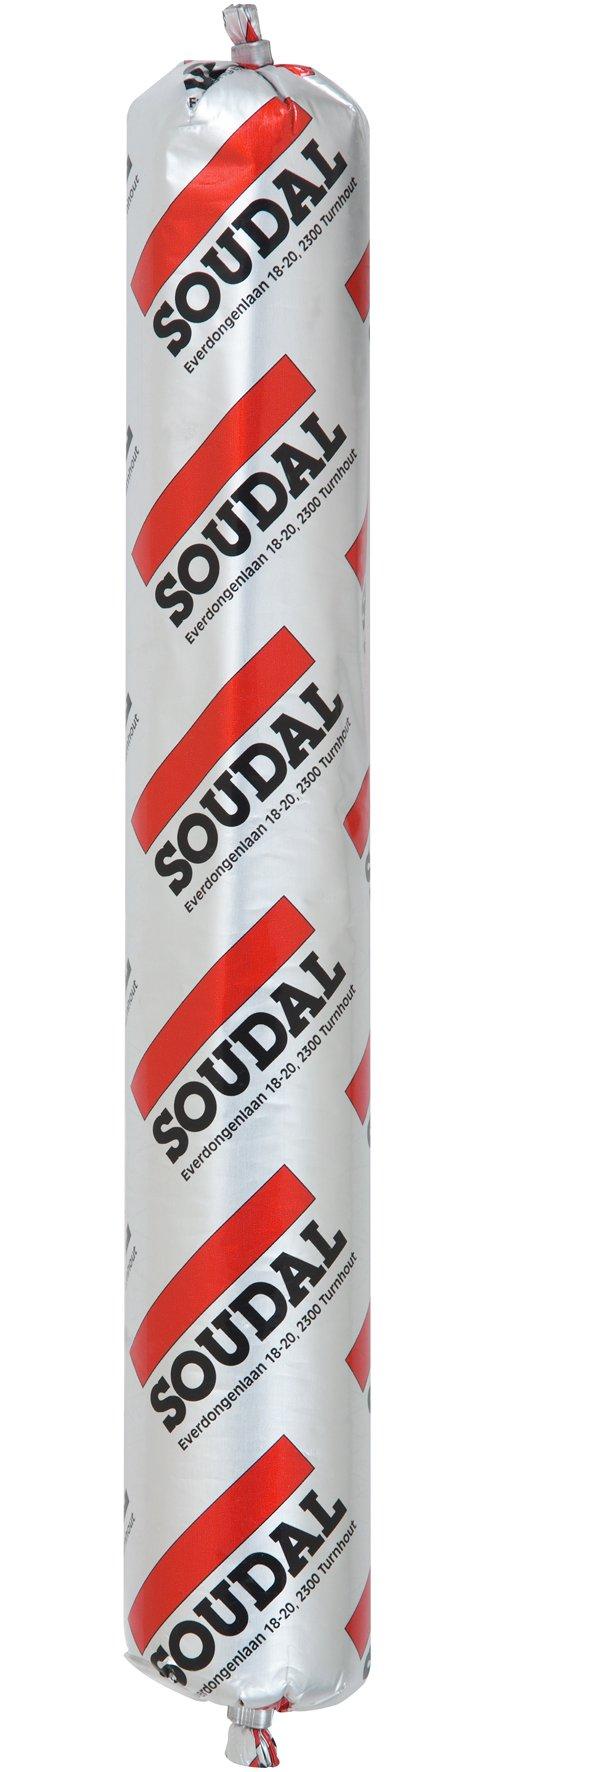 Tmel Butyrub 600ml Soudal - bílý